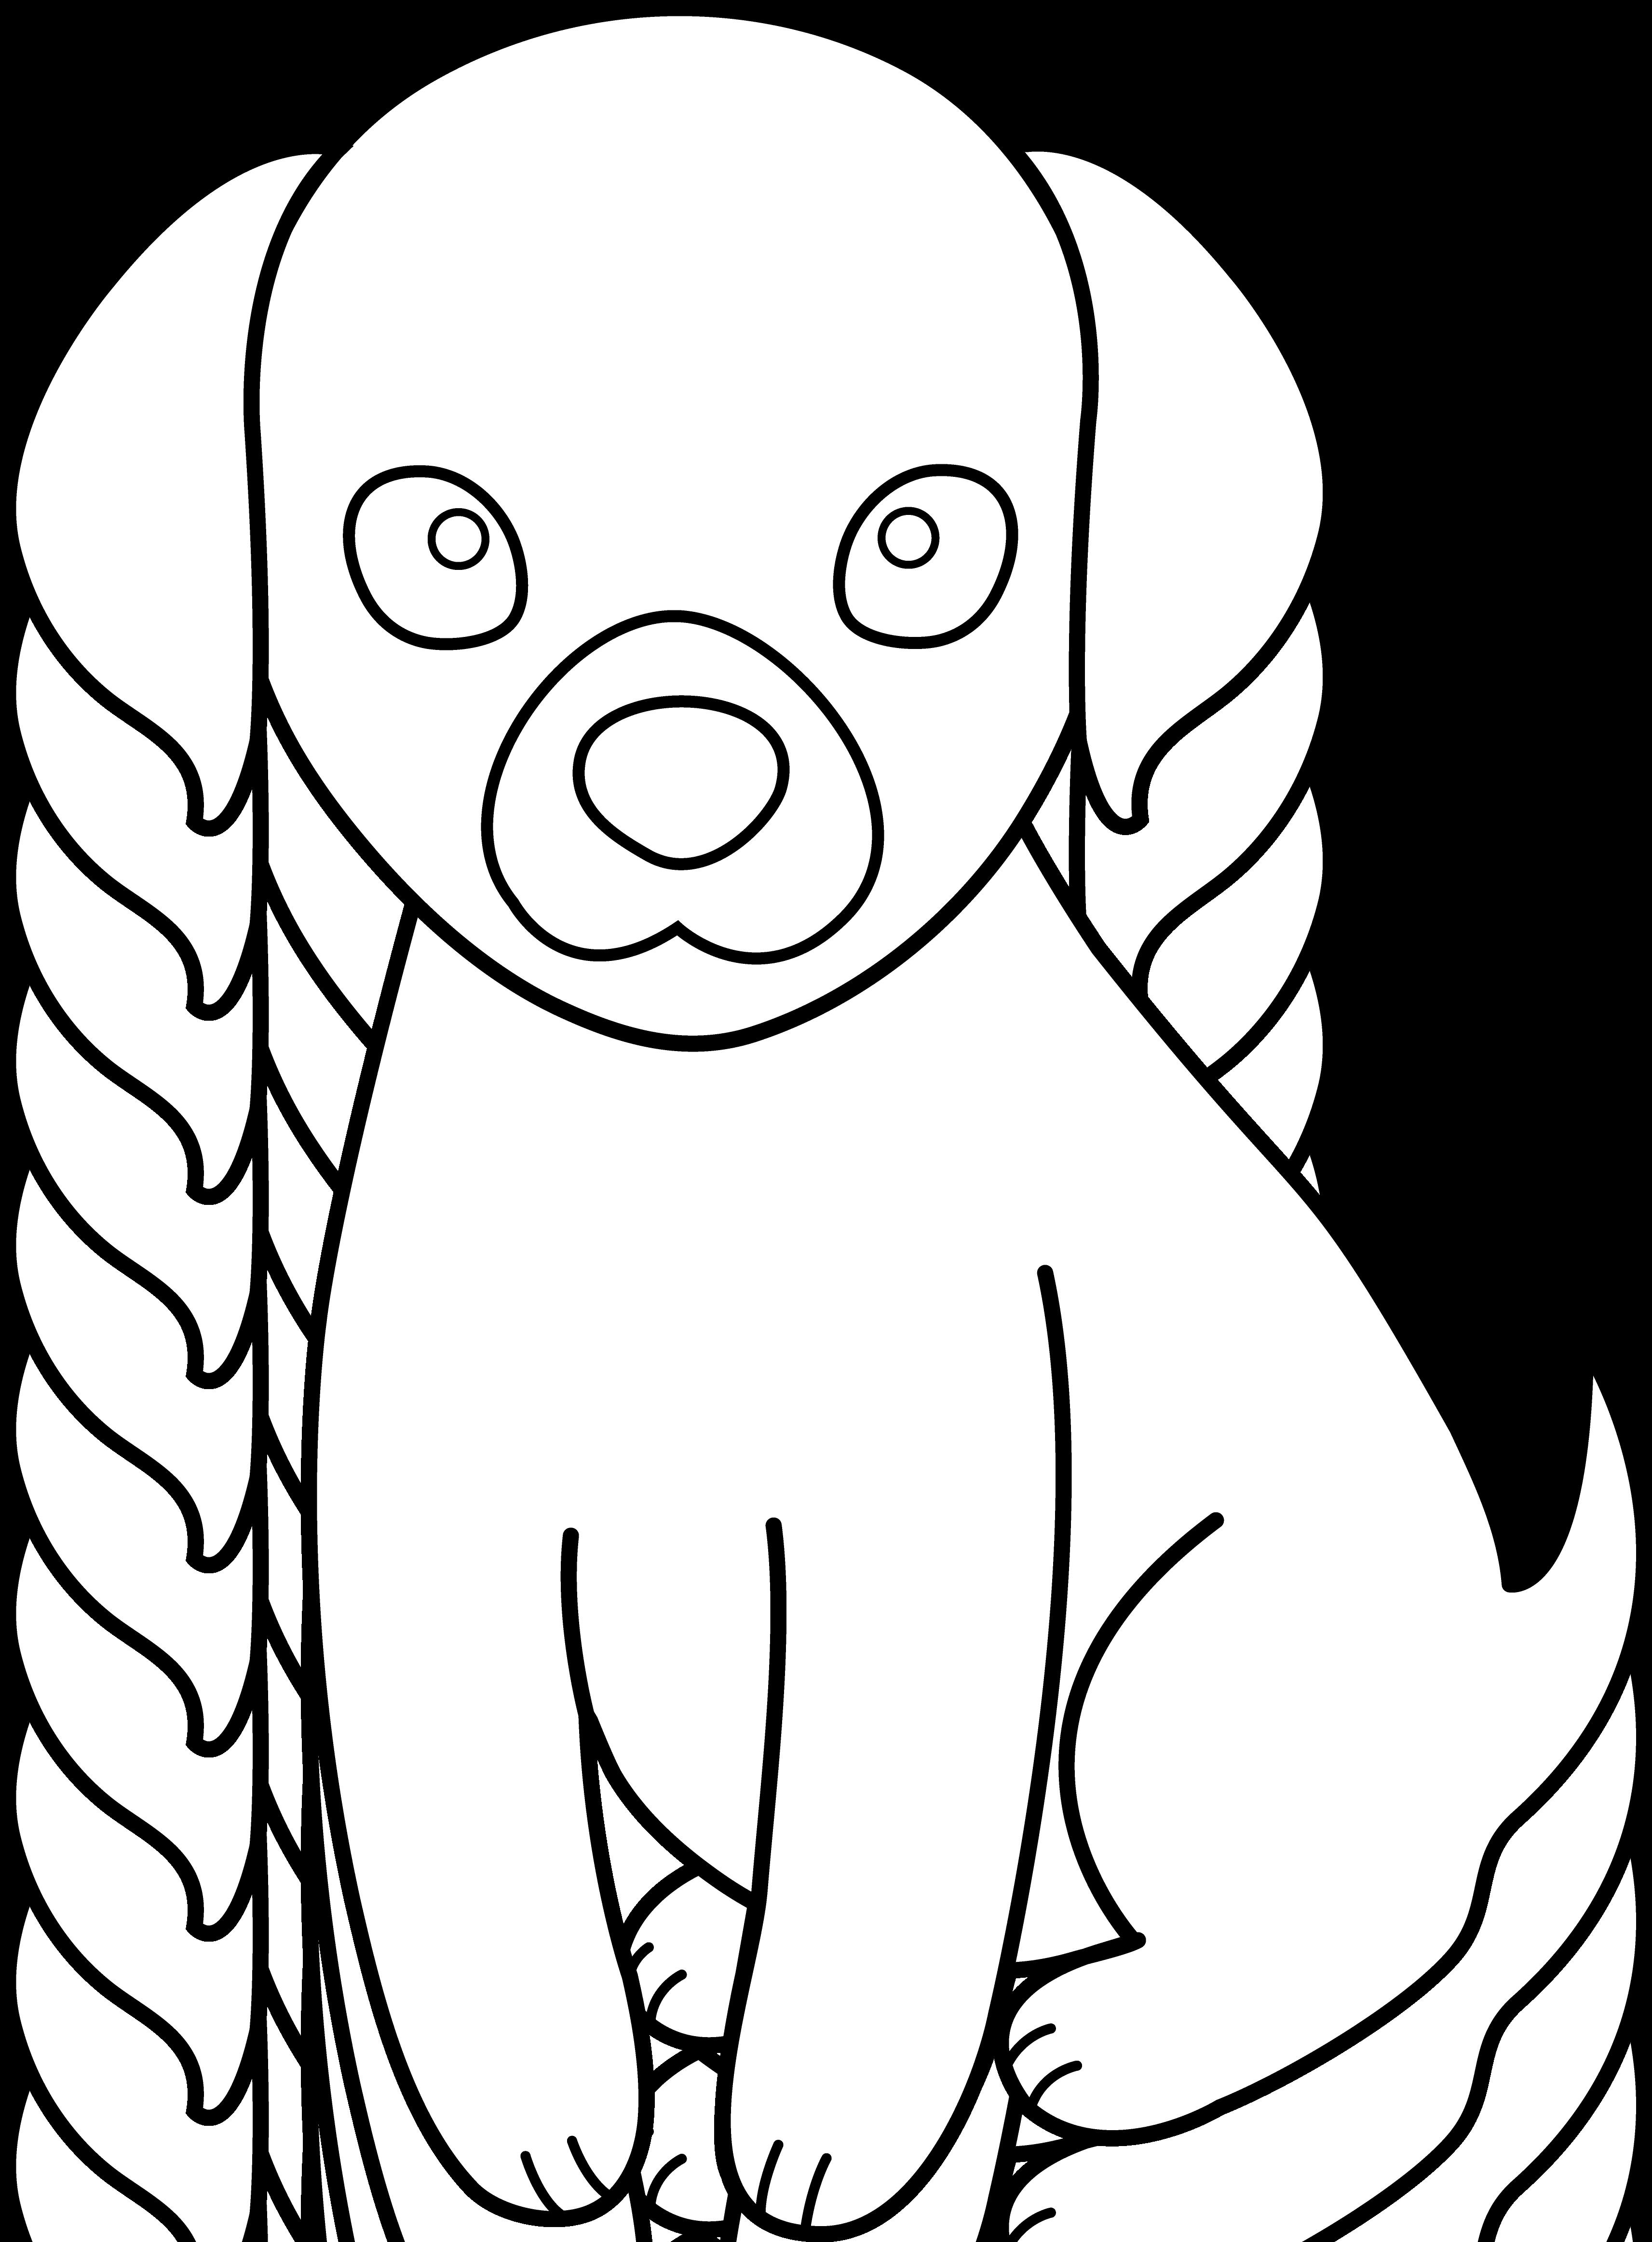 Colorable puppy line art. Doghouse clipart hen house